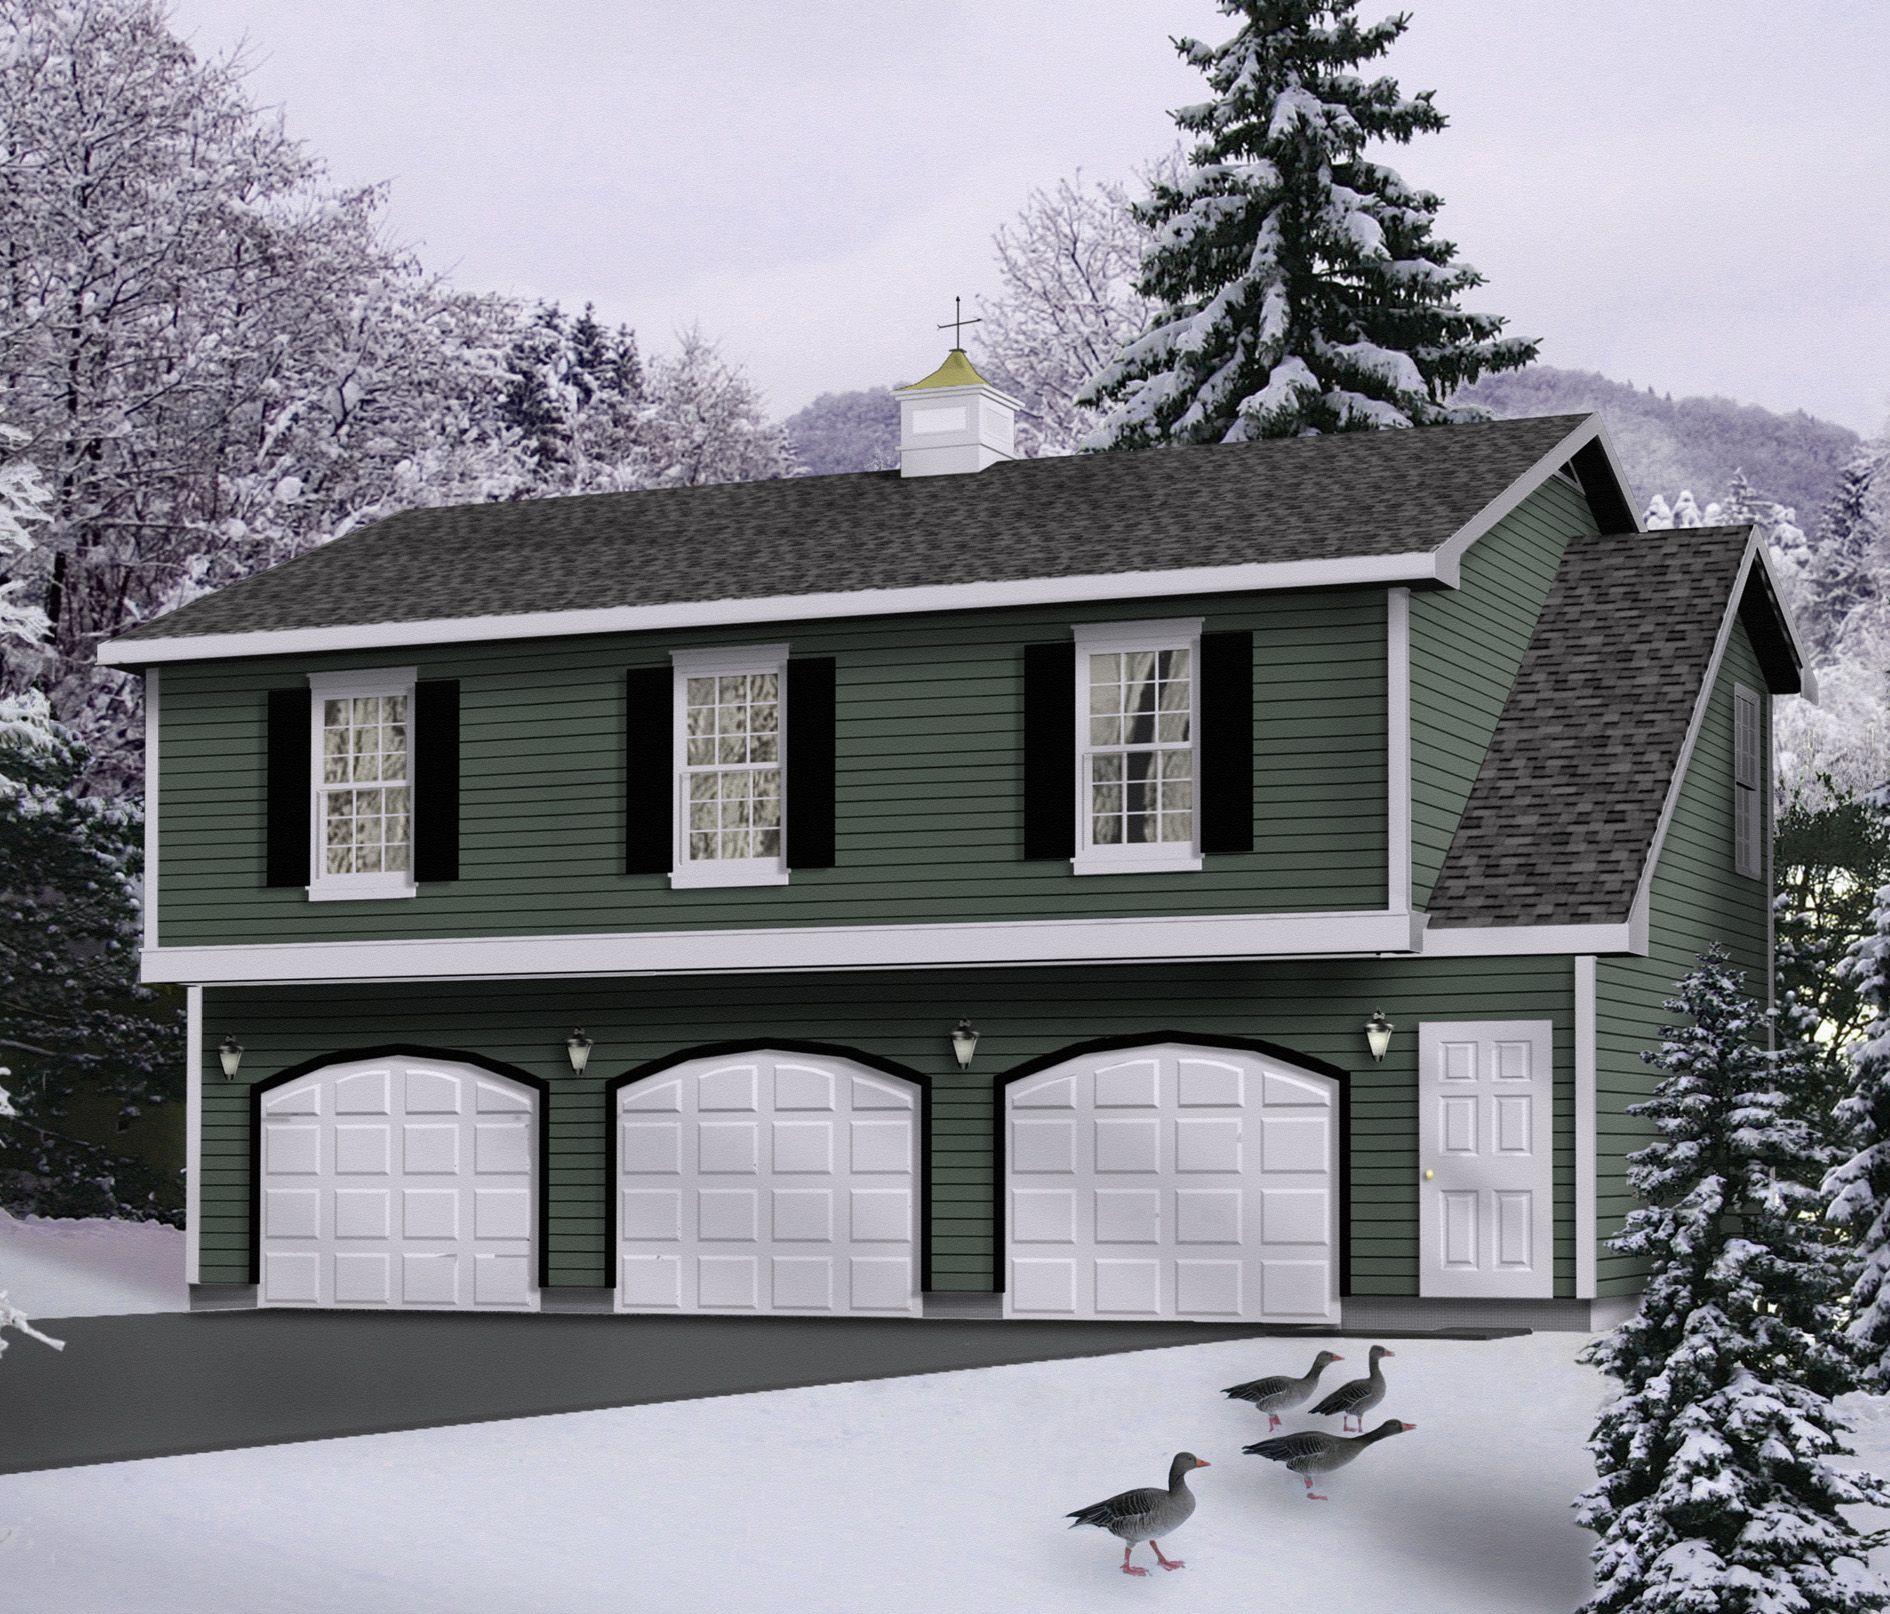 Plan 2236SL: Affordable Garage Apartment